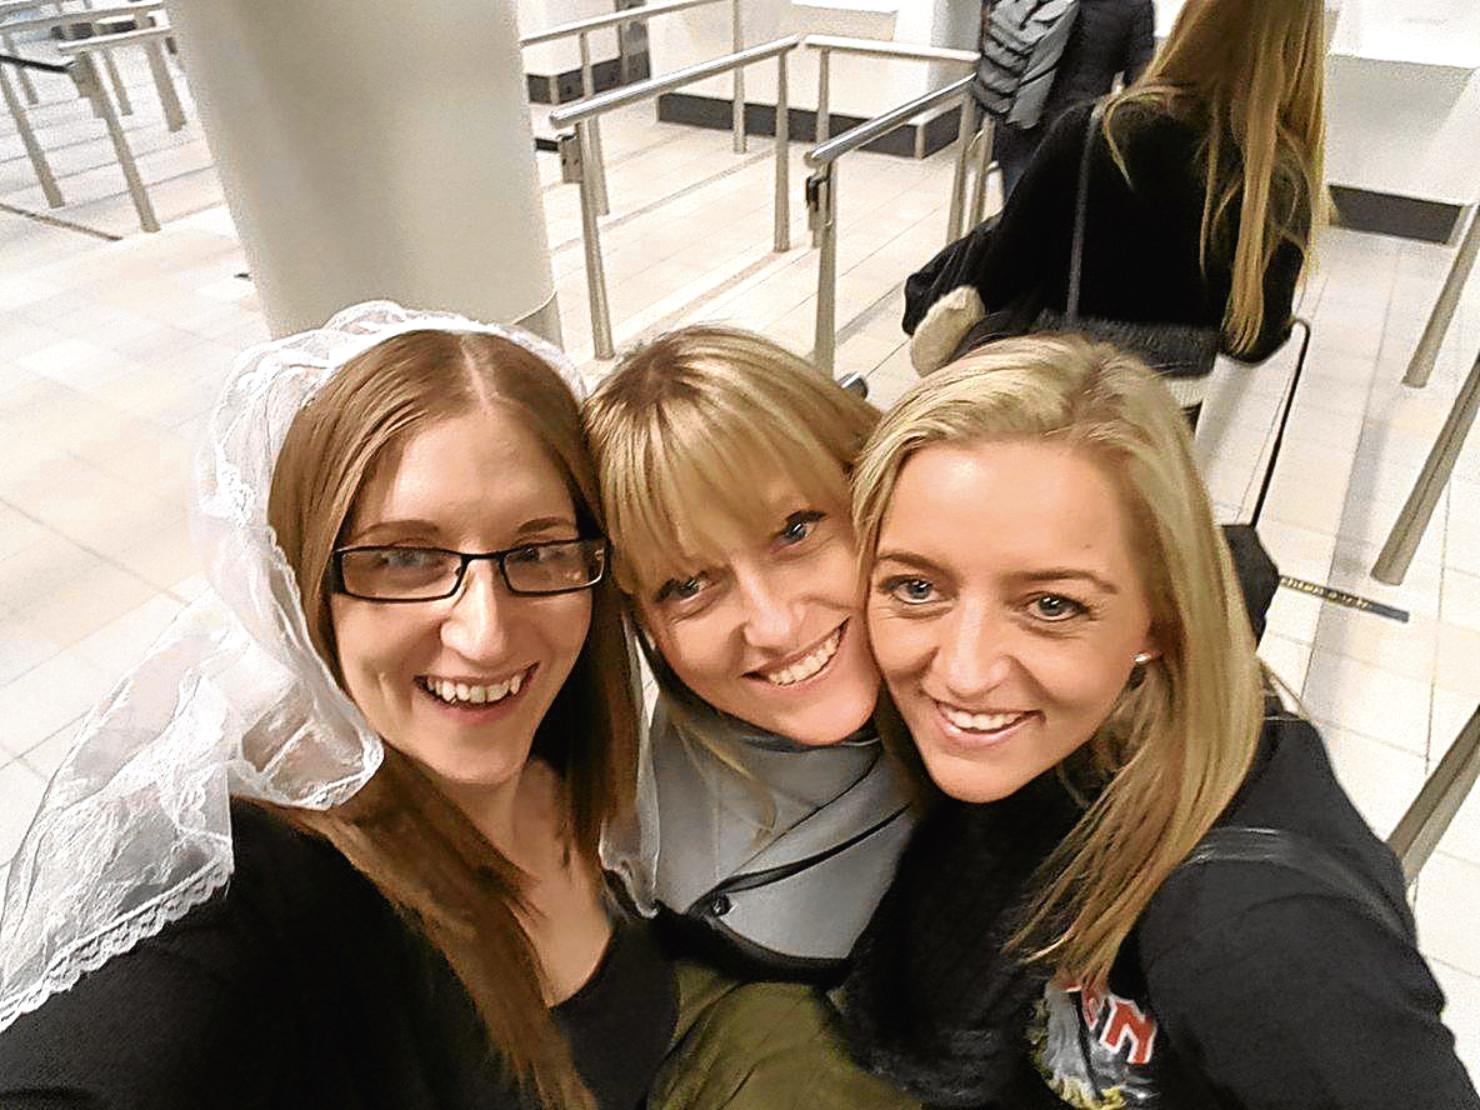 Nicky crooks, Gillian McAuley, Kerri Fleming (left to right)